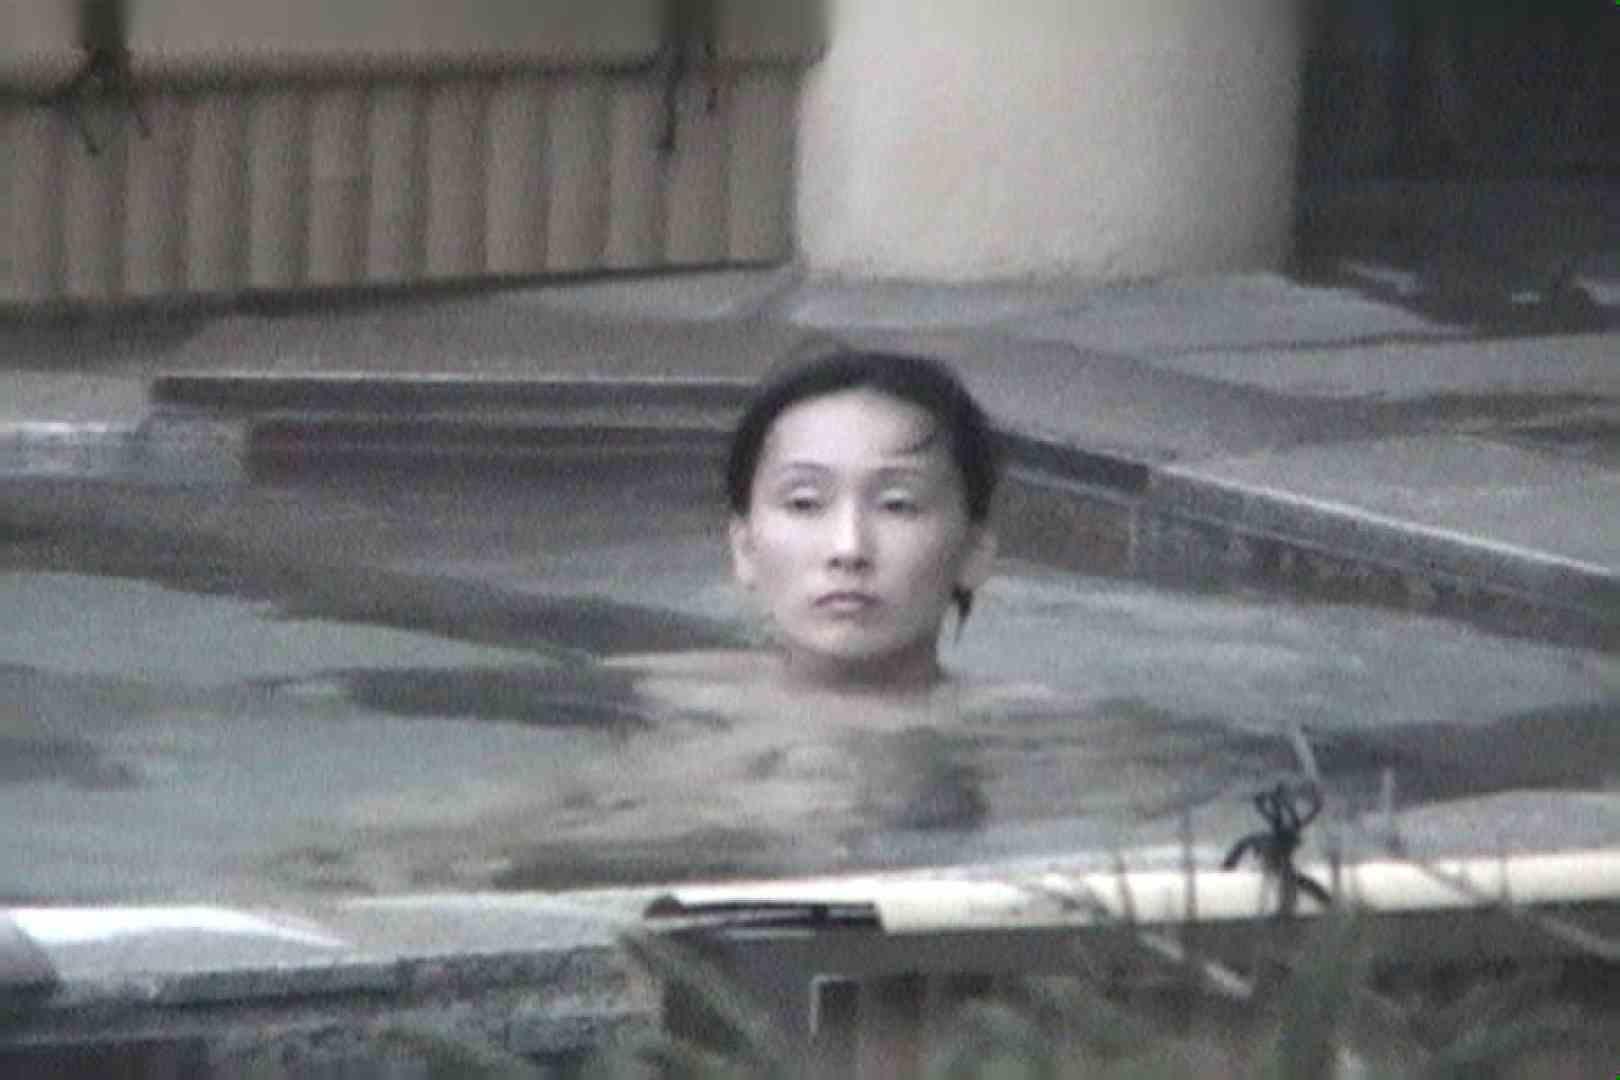 Aquaな露天風呂Vol.557 OLのエロ生活 | 露天風呂  34連発 1